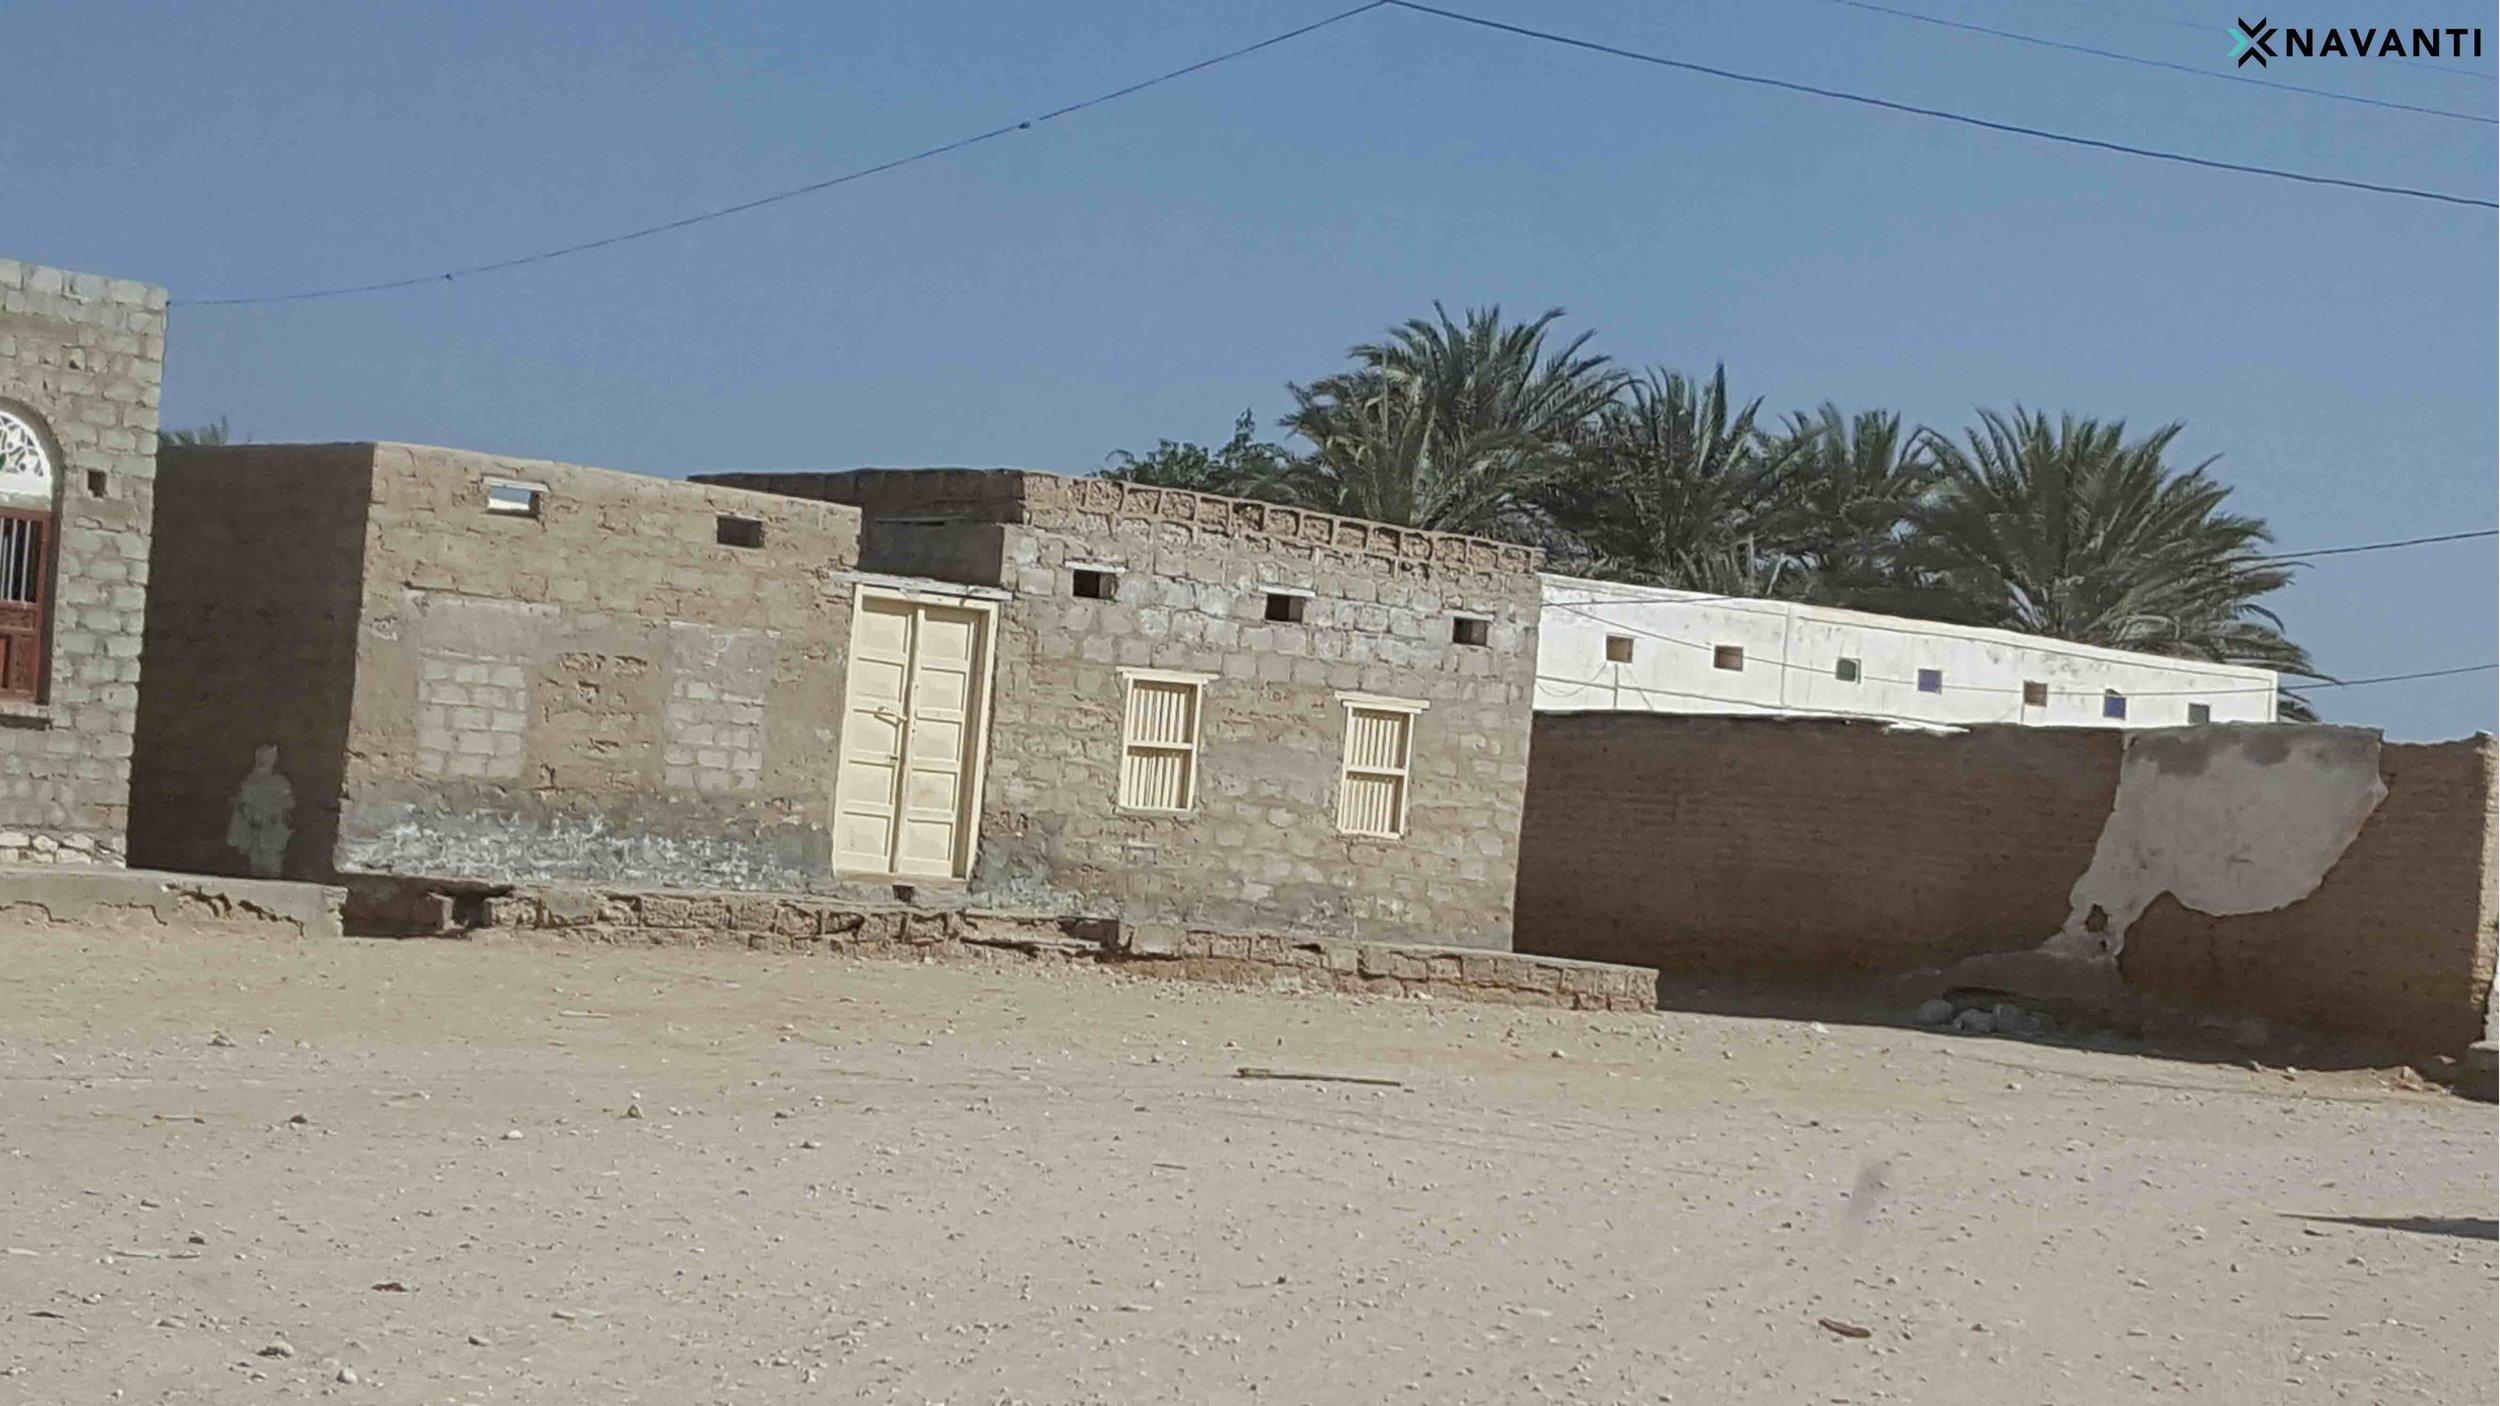 Working class homes in Sayhut, al-Mahra. Source: Navanti